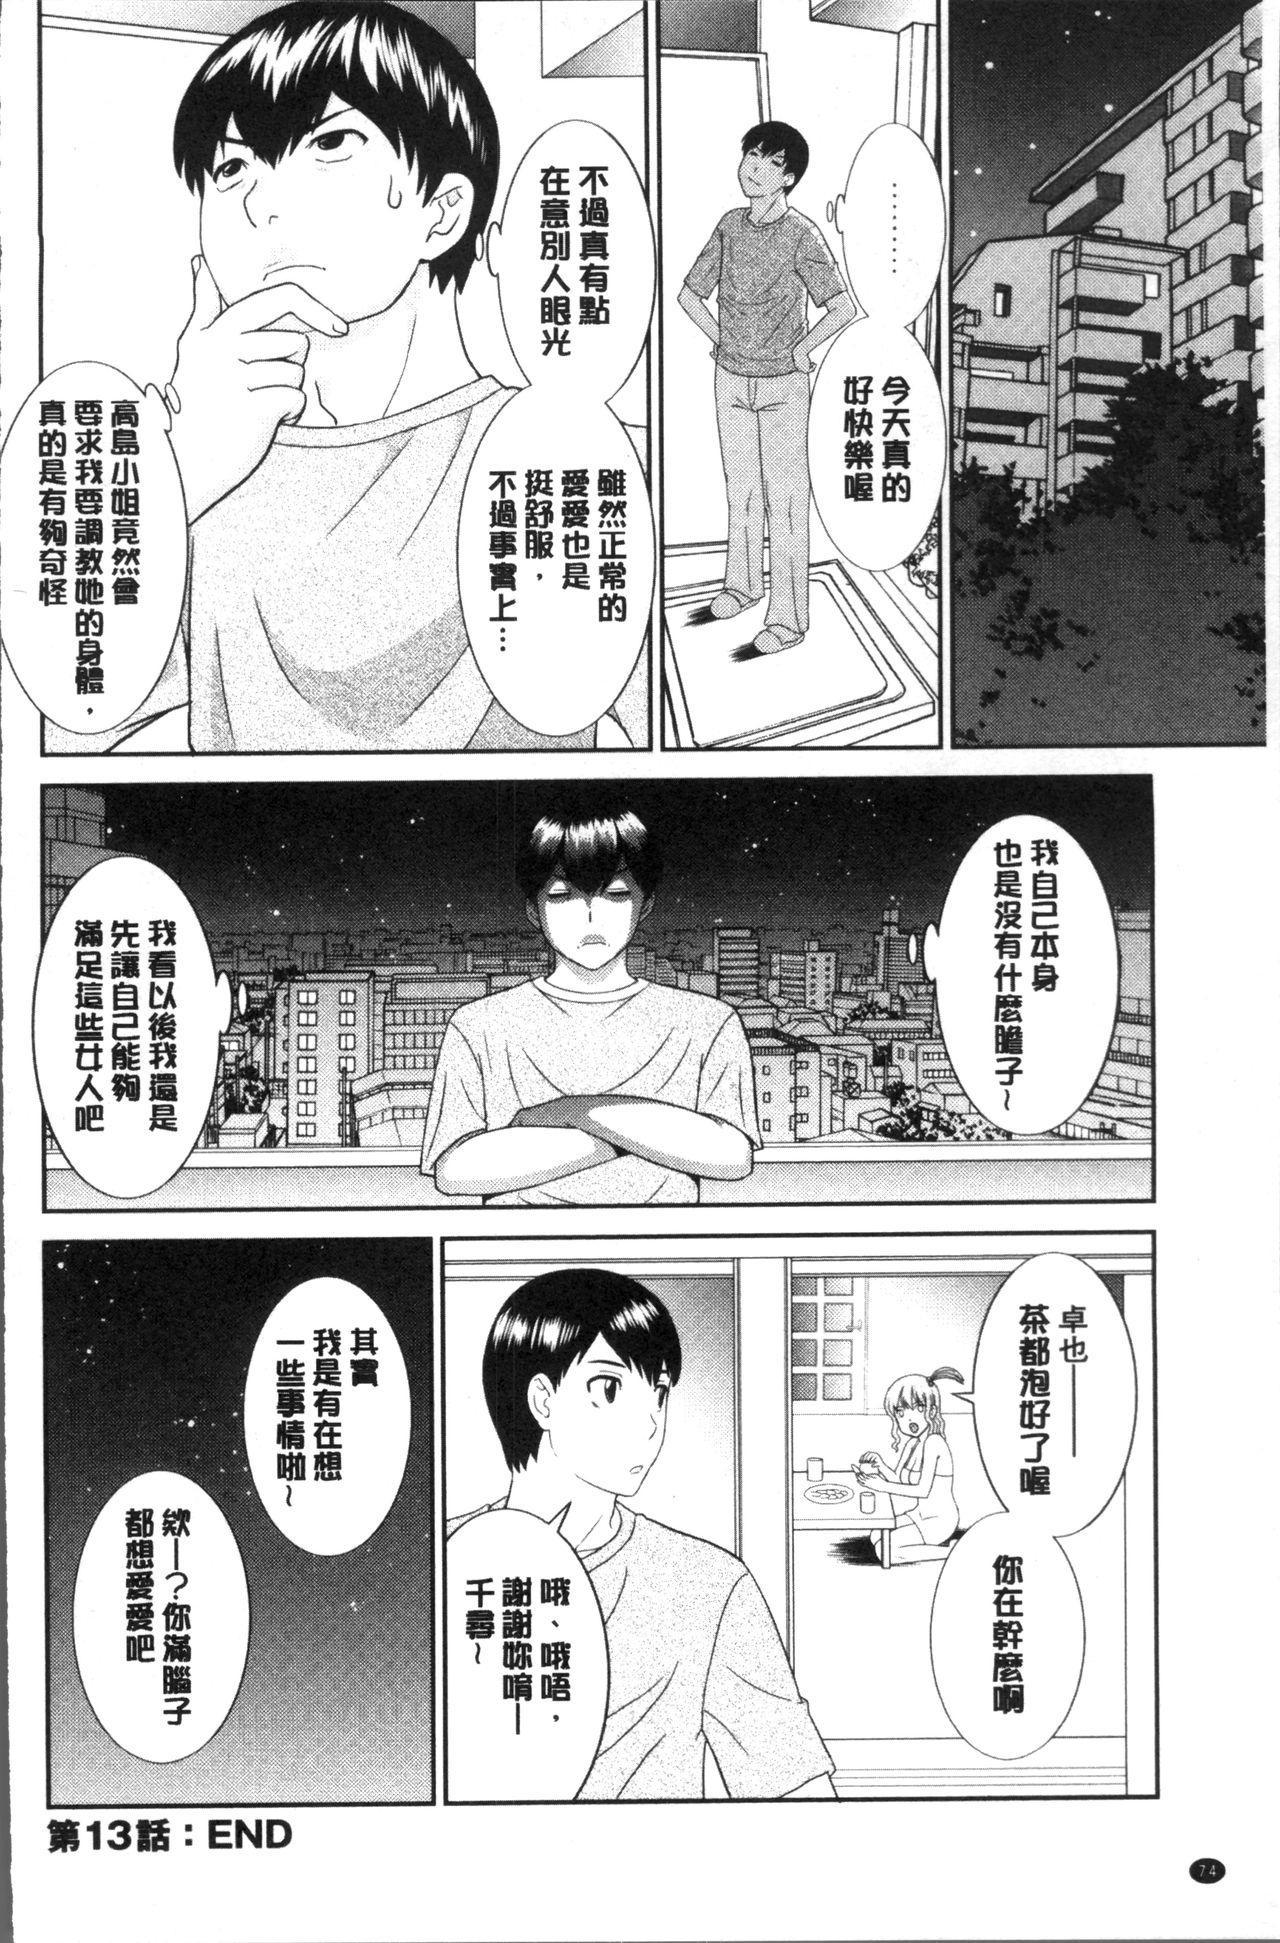 [Kawamori Misaki] Innyuu Shufu no Futei Ganbou - Oku-san to Kanojo to 2 | 淫乳主婦的不貞願望 和人妻也和女友❤2 [Chinese] 77